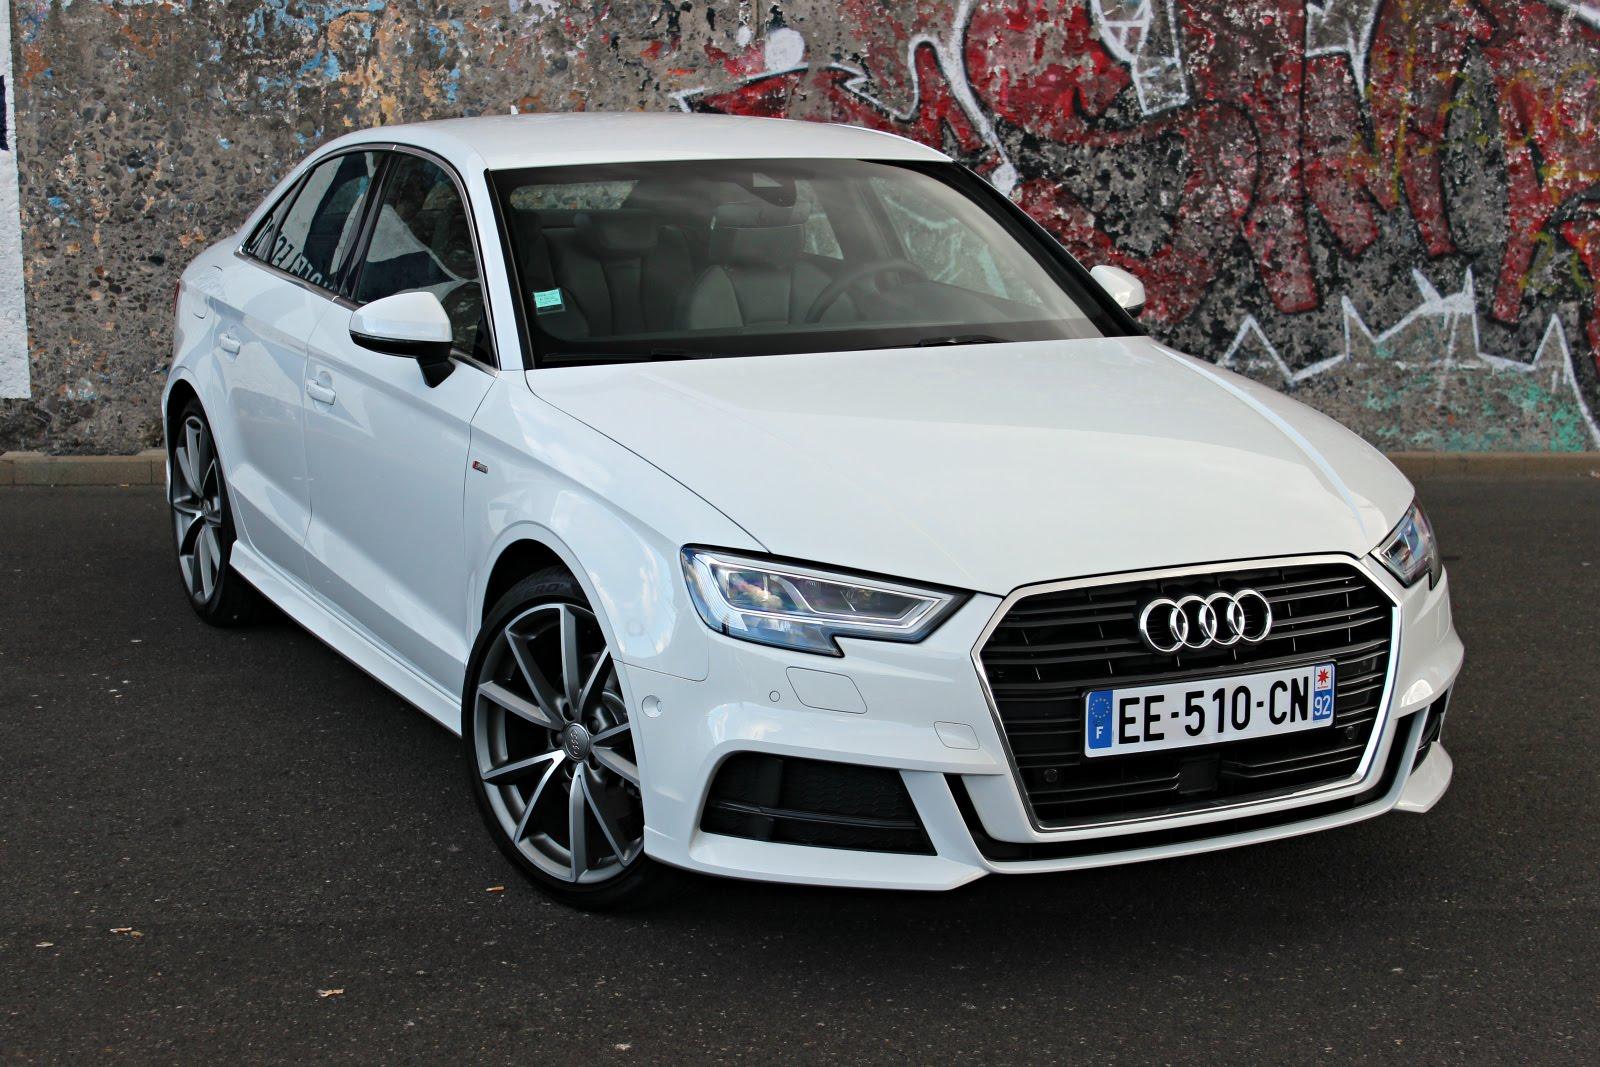 High Quality Tuning Files Audi A3 2.0 TFSI 190hp